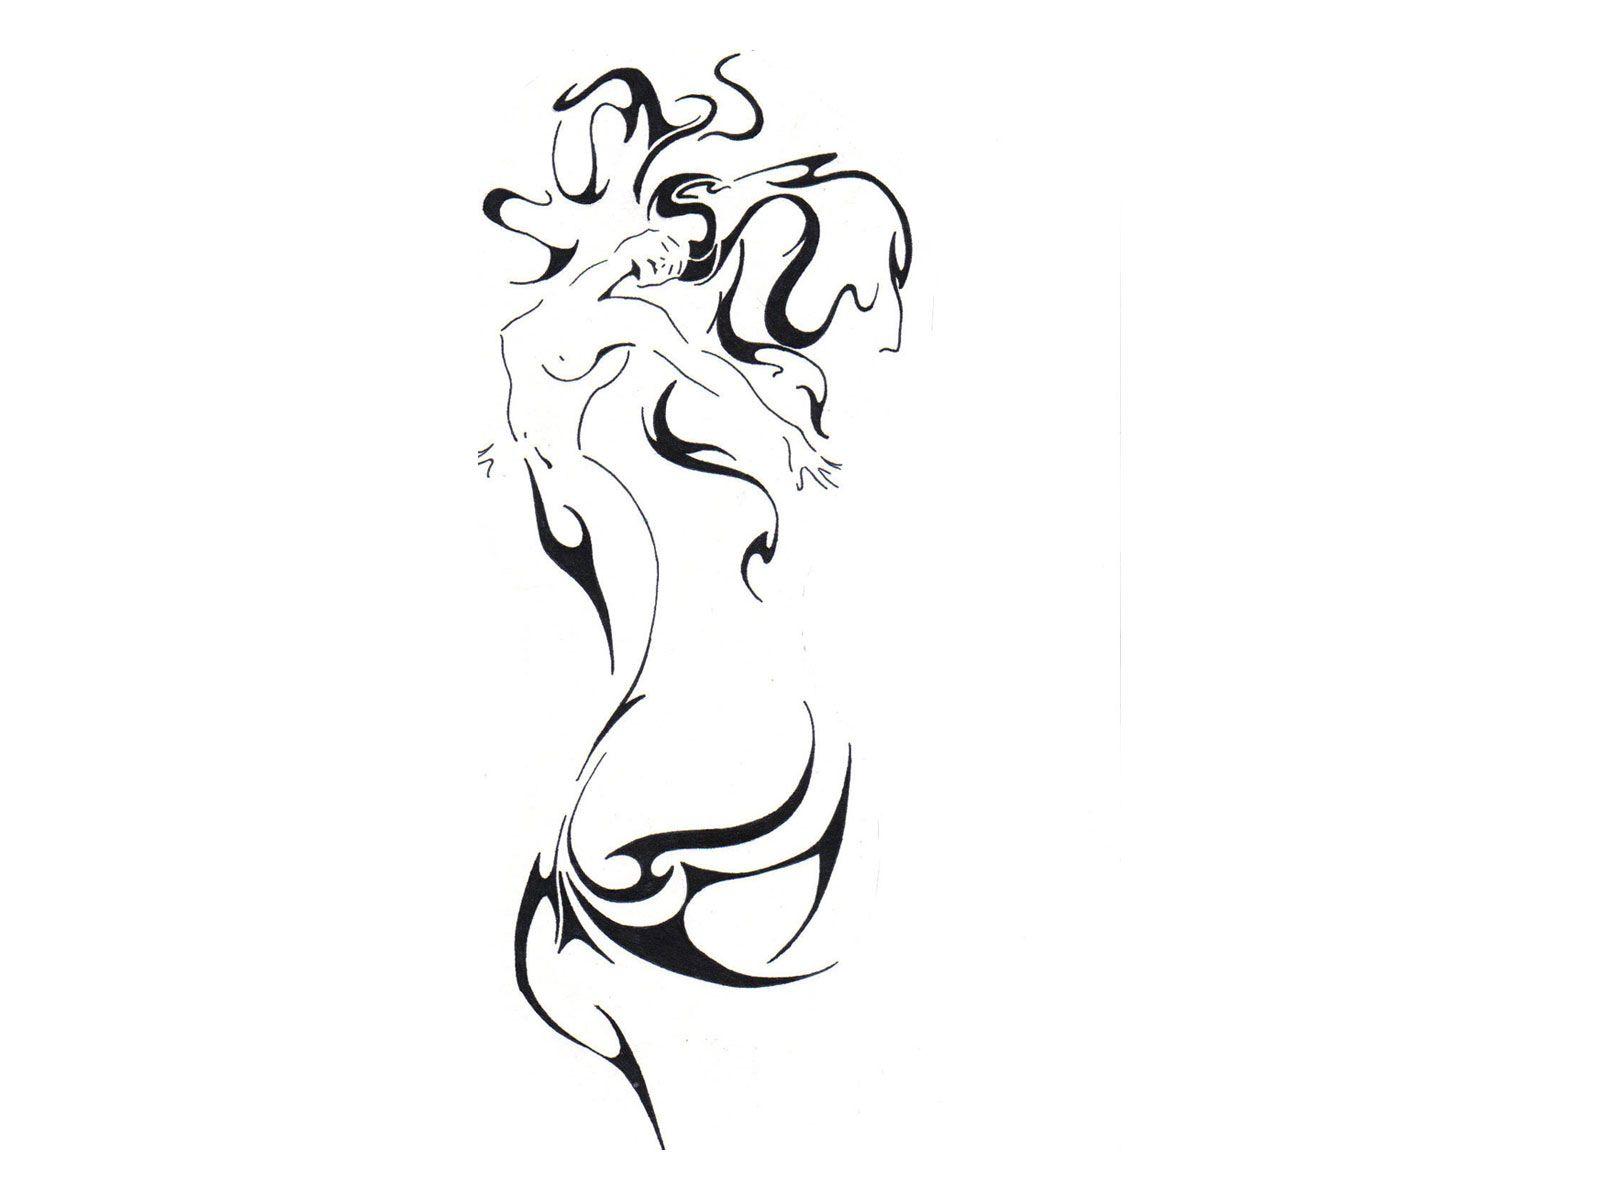 Mermaid Drawing Images